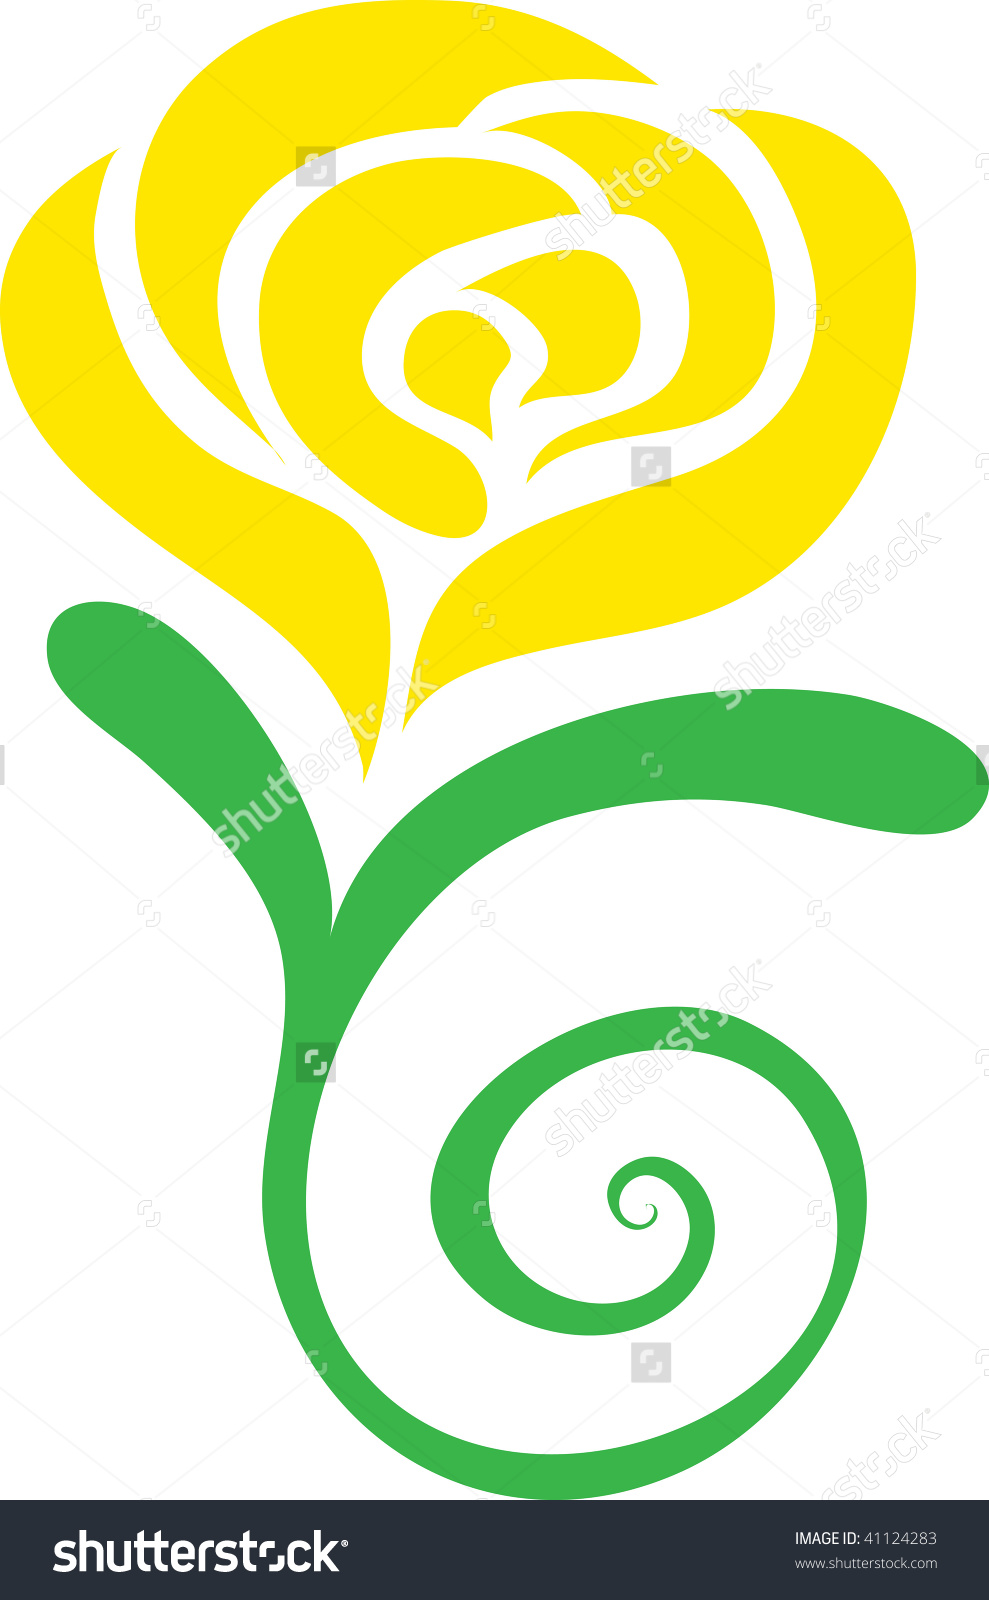 Clip art illustration of a yellow rose. -Clip art illustration of a yellow rose. Preview. Save to a lightbox-16